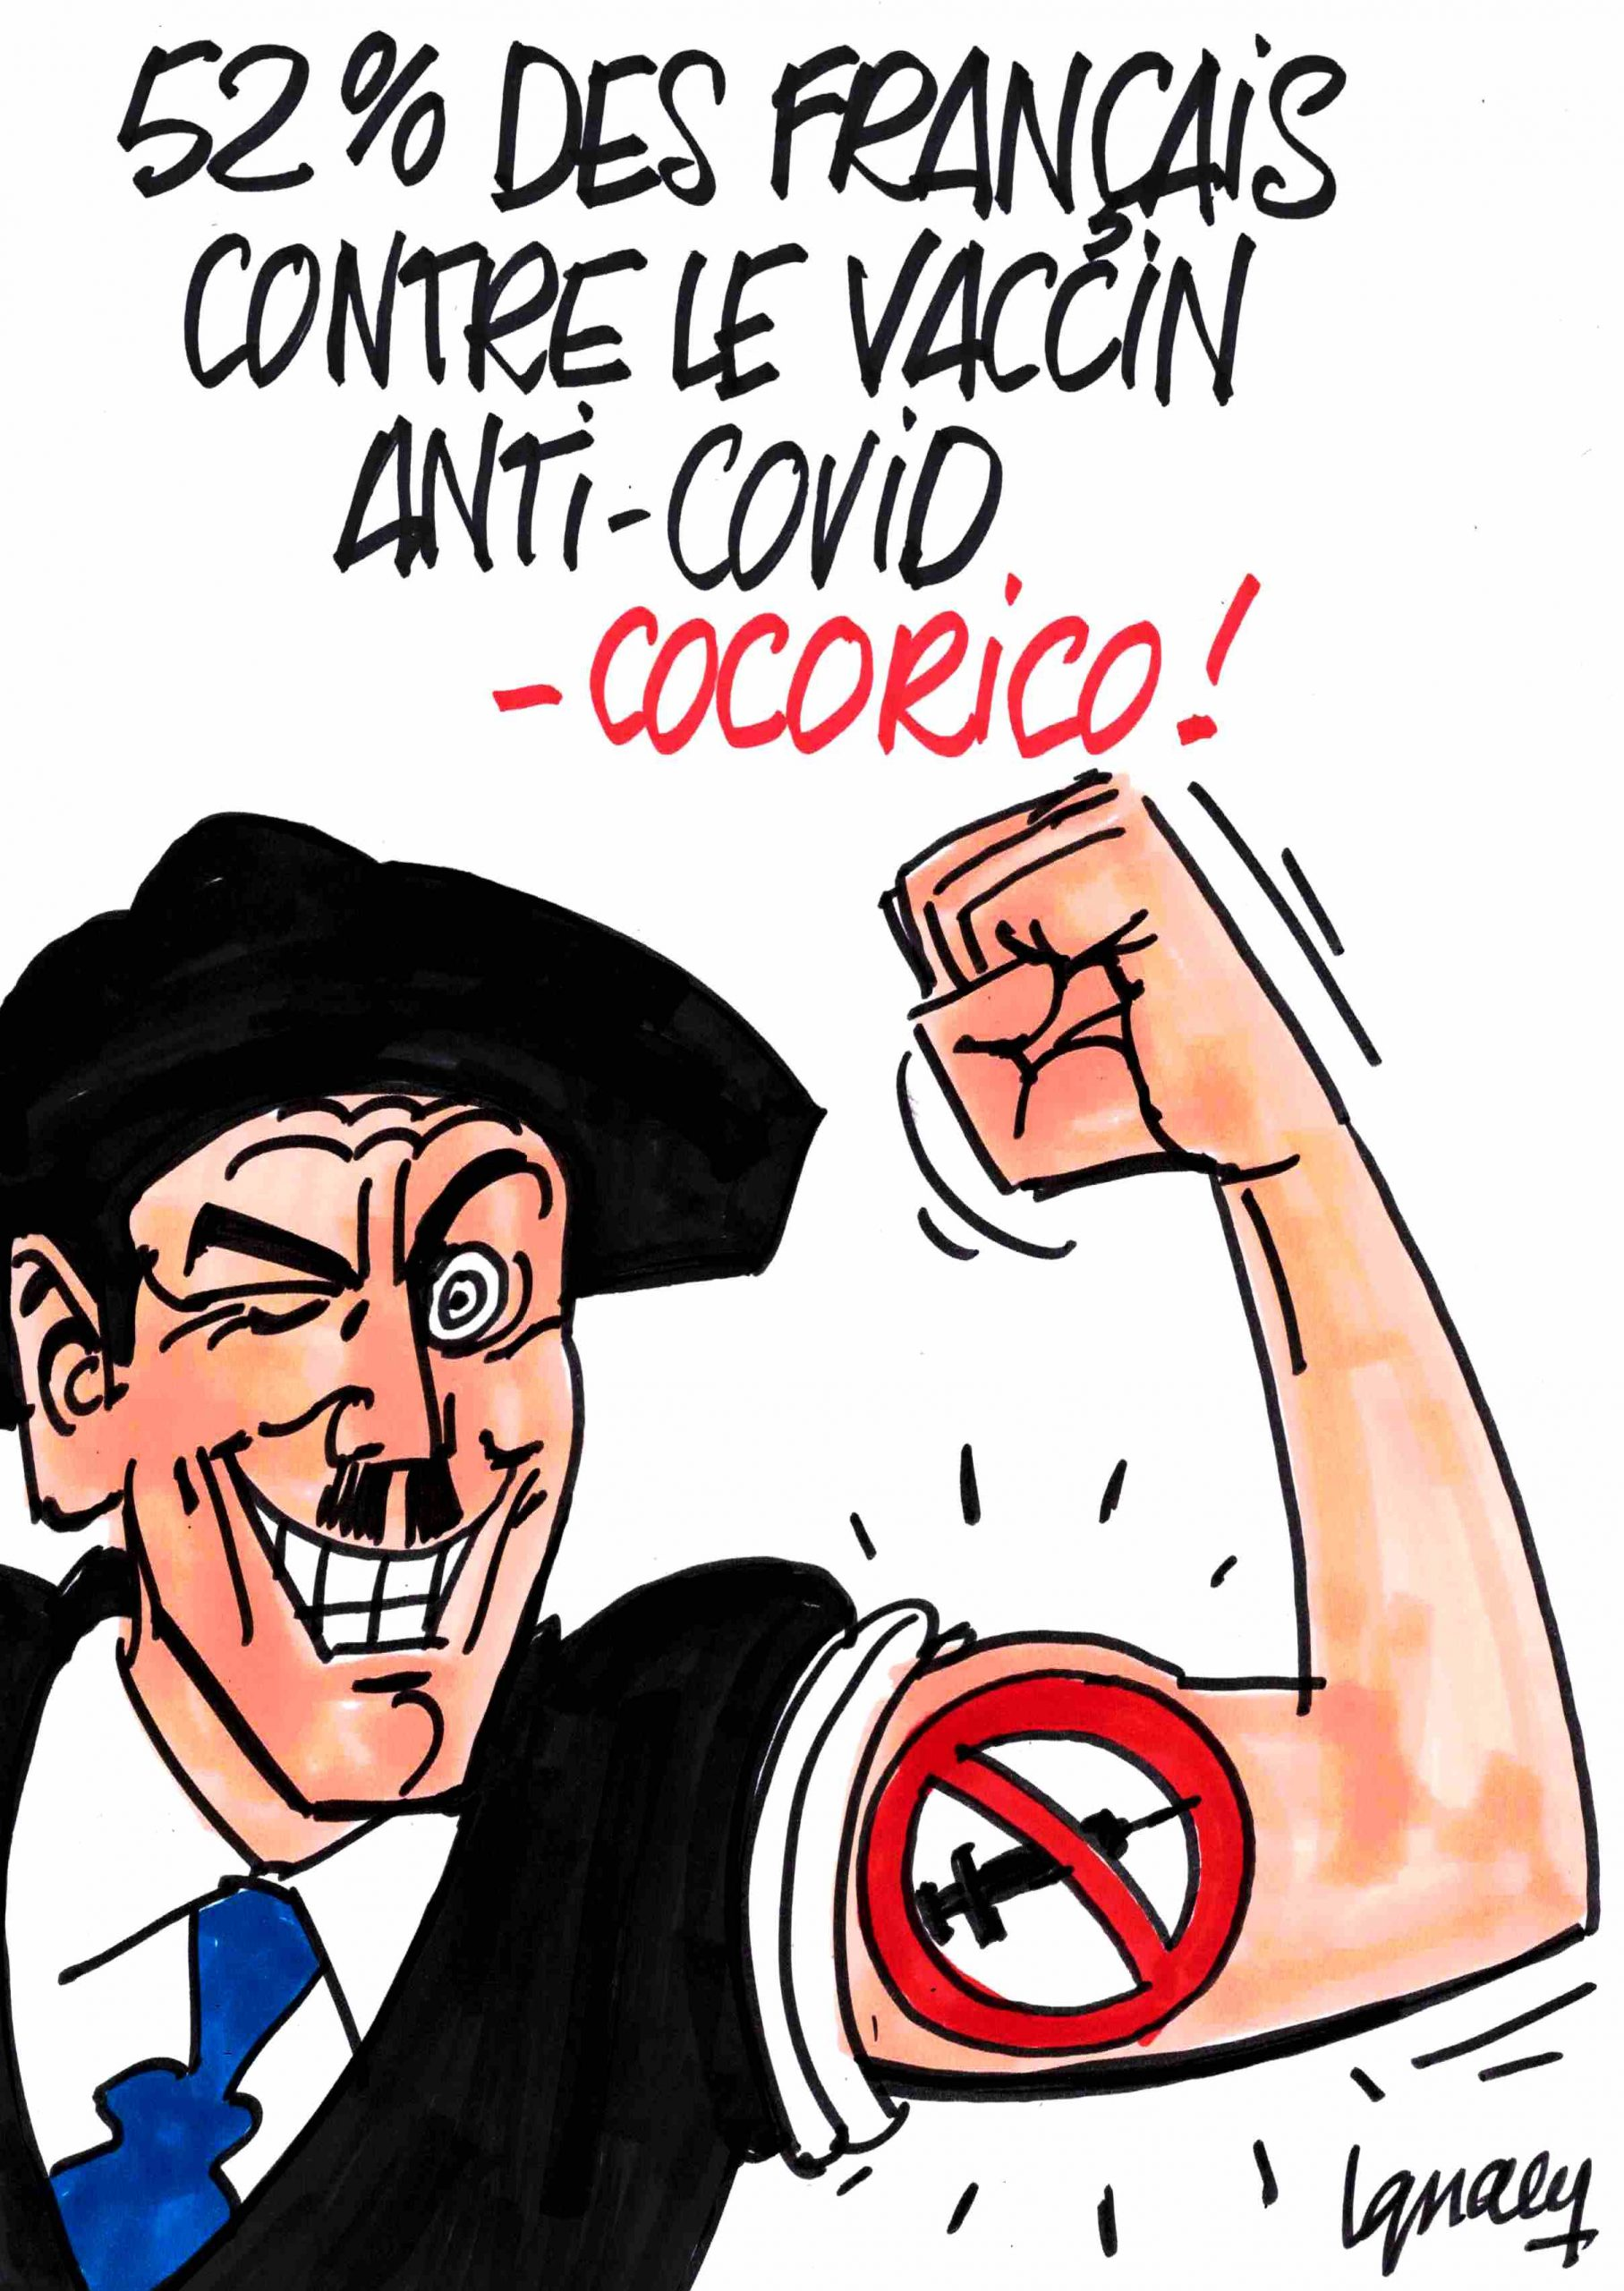 Ignace - 52% des Français contre le vaccin anti-covid